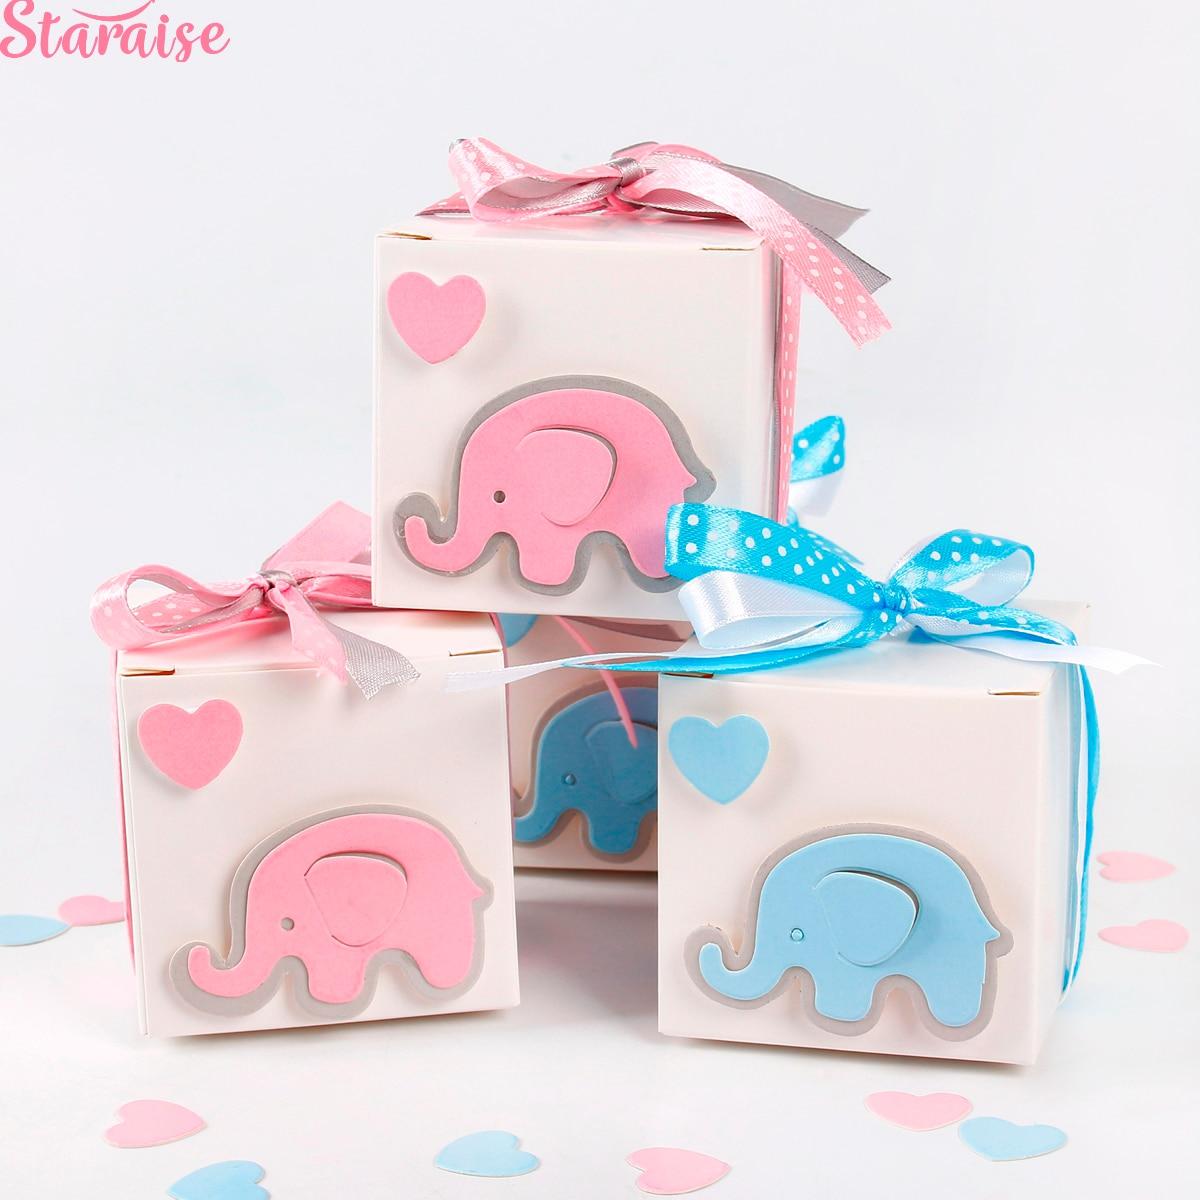 Staraise DIY Cartoon Animal Candy Box Baby Shower Birthday Party Wedding Gift Decoration Kids